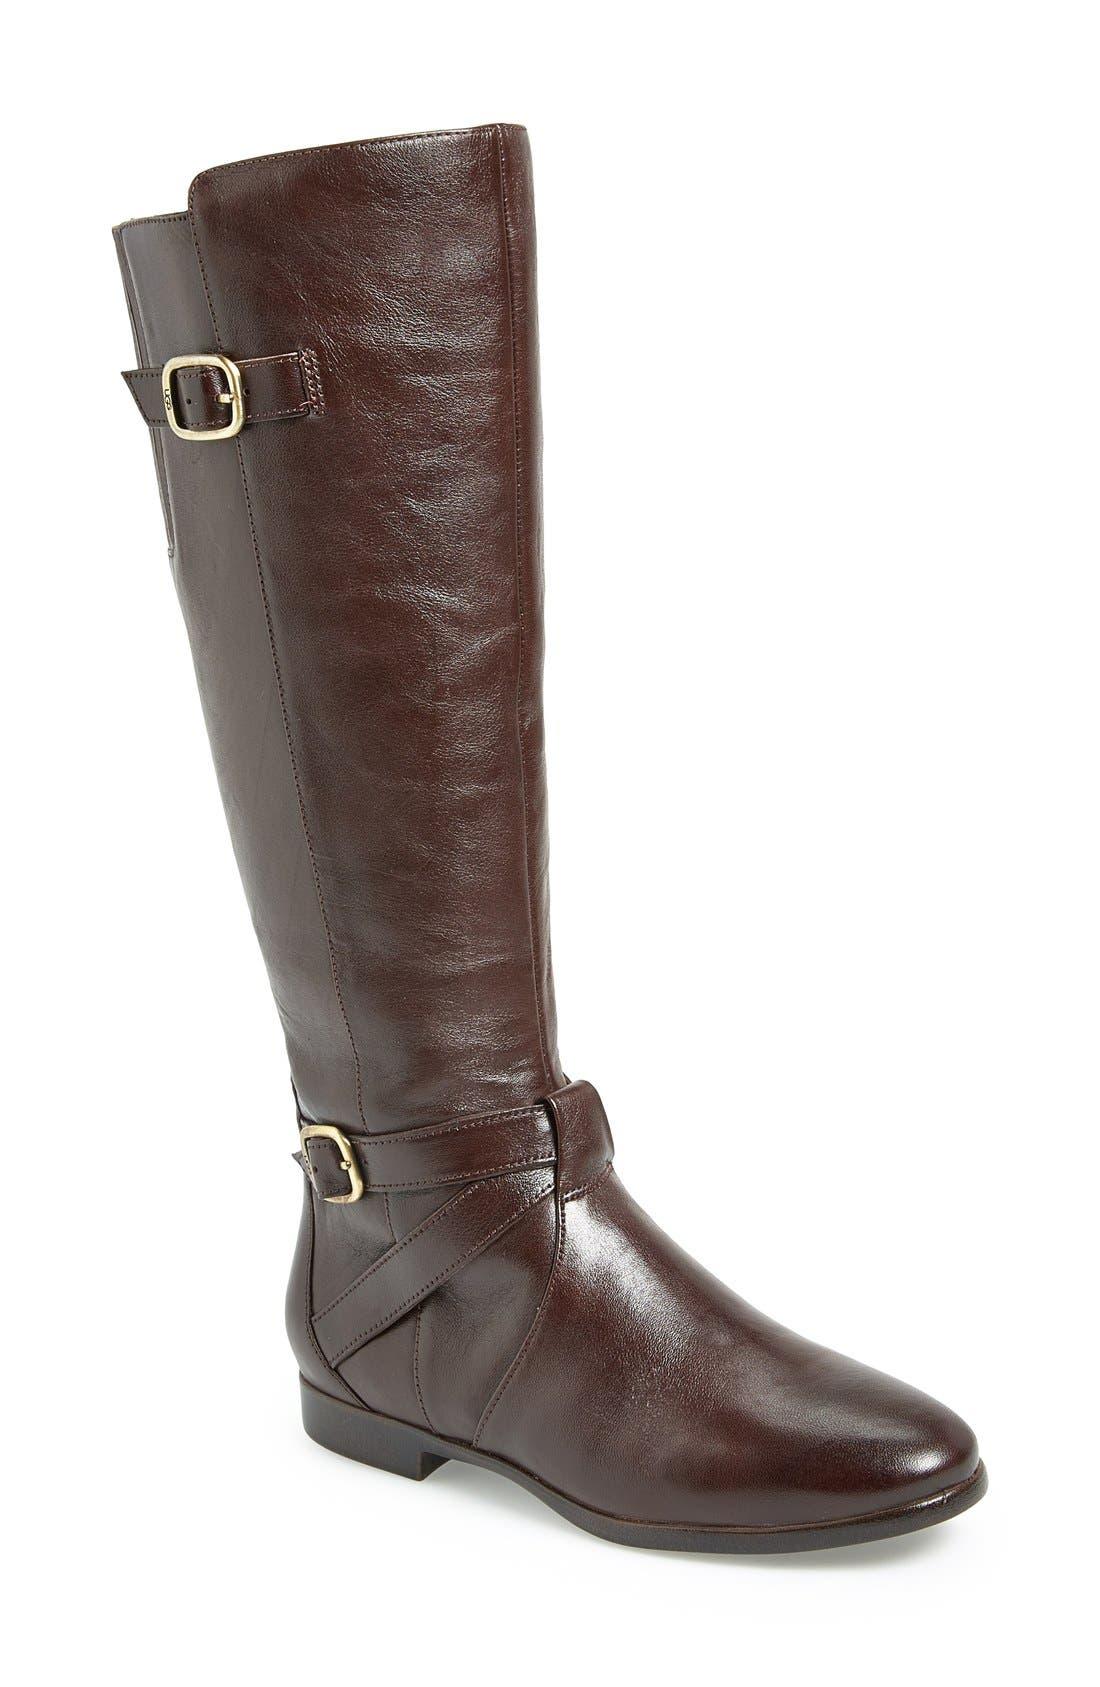 Main Image - UGG® Australia 'Beryl' Riding Boot (Wide Calf) (Women)